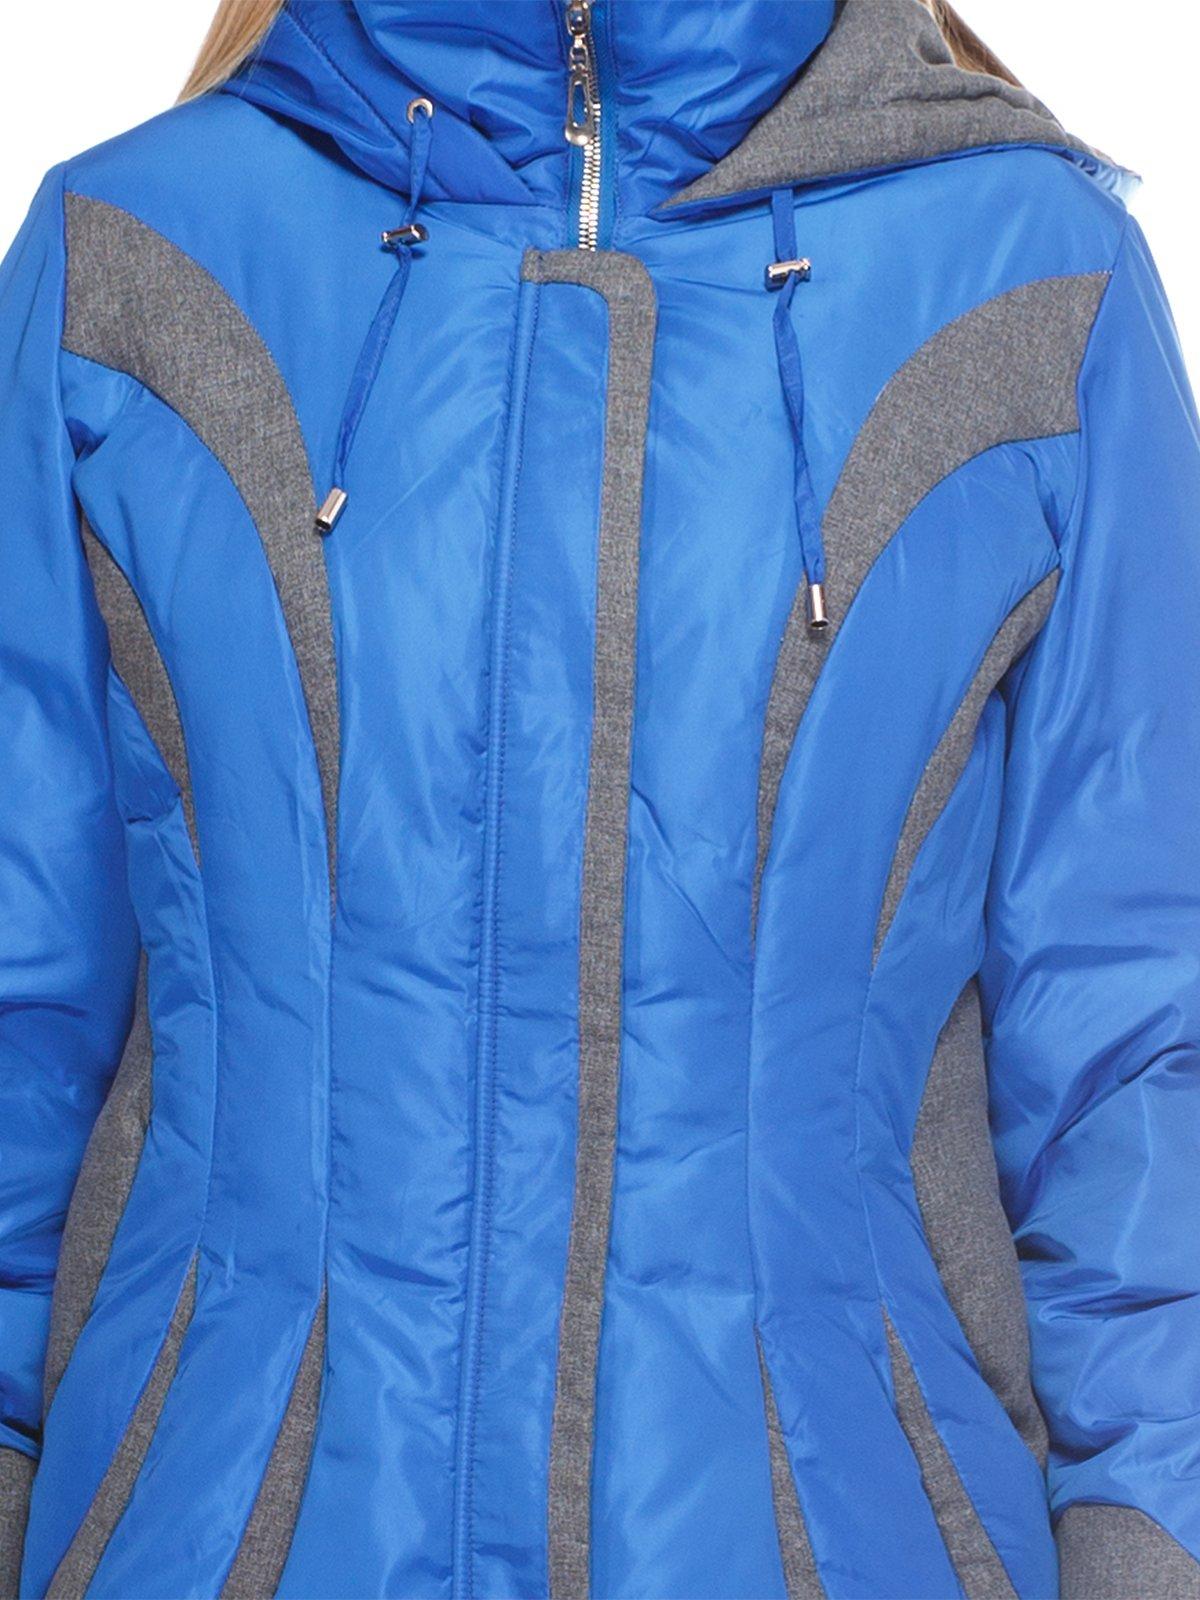 Пальто синее | 3845058 | фото 3